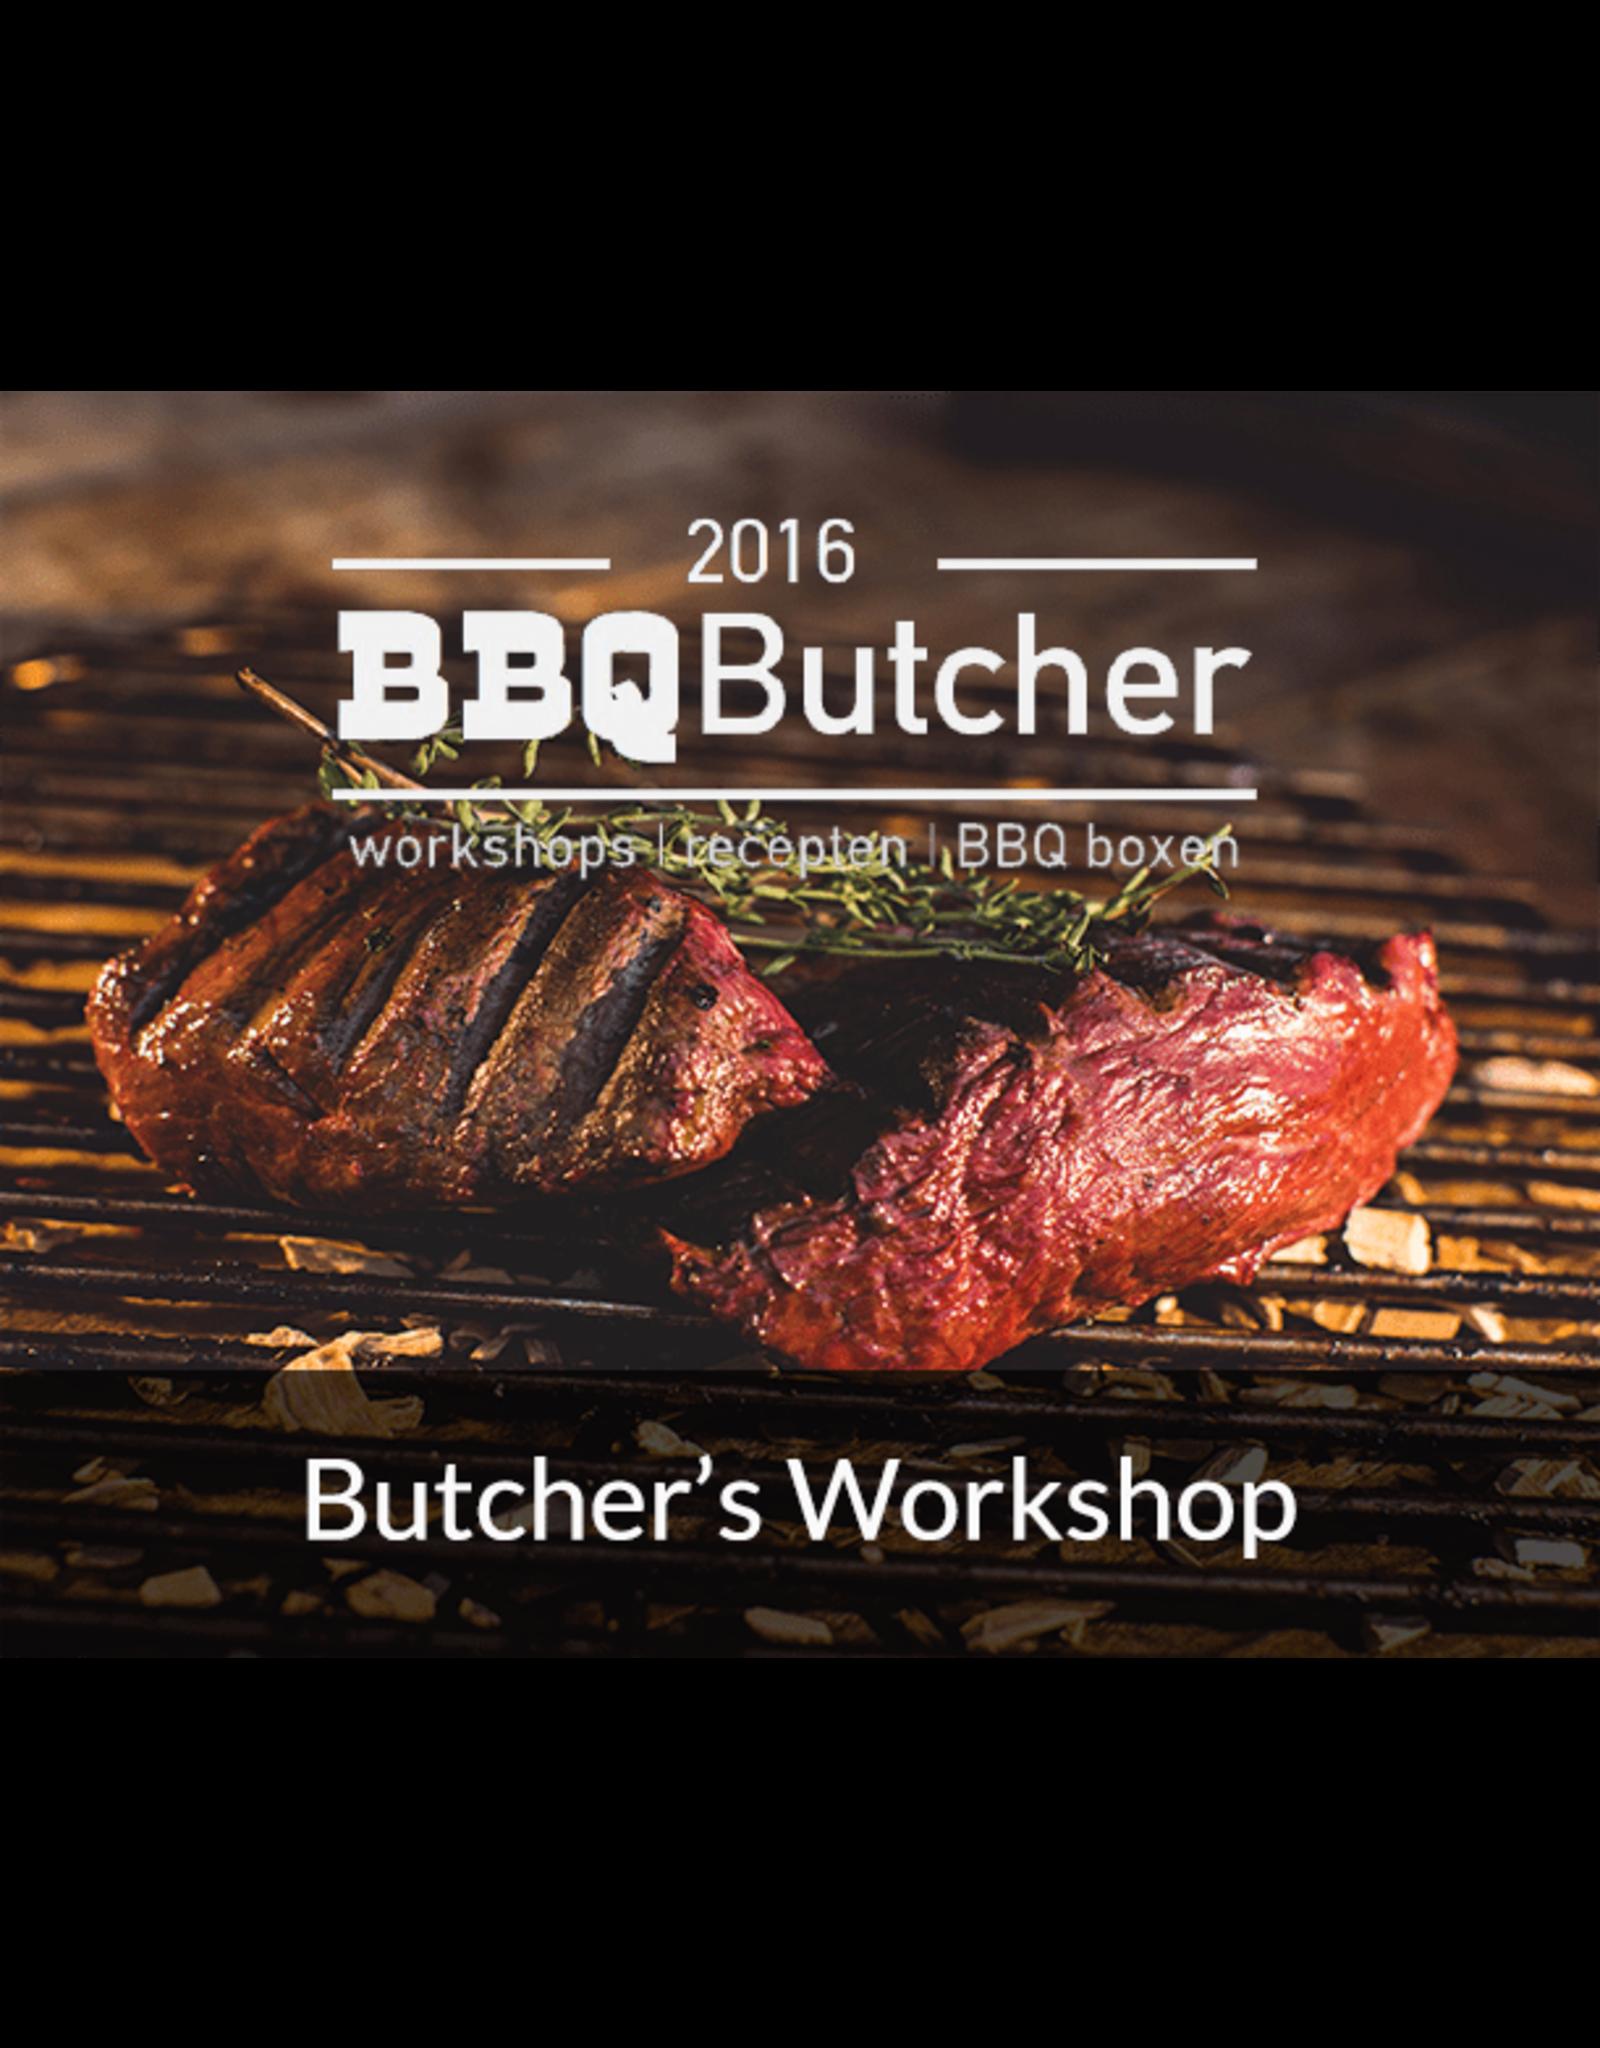 BBQ Butcher#1 Workshop  26-06-2021